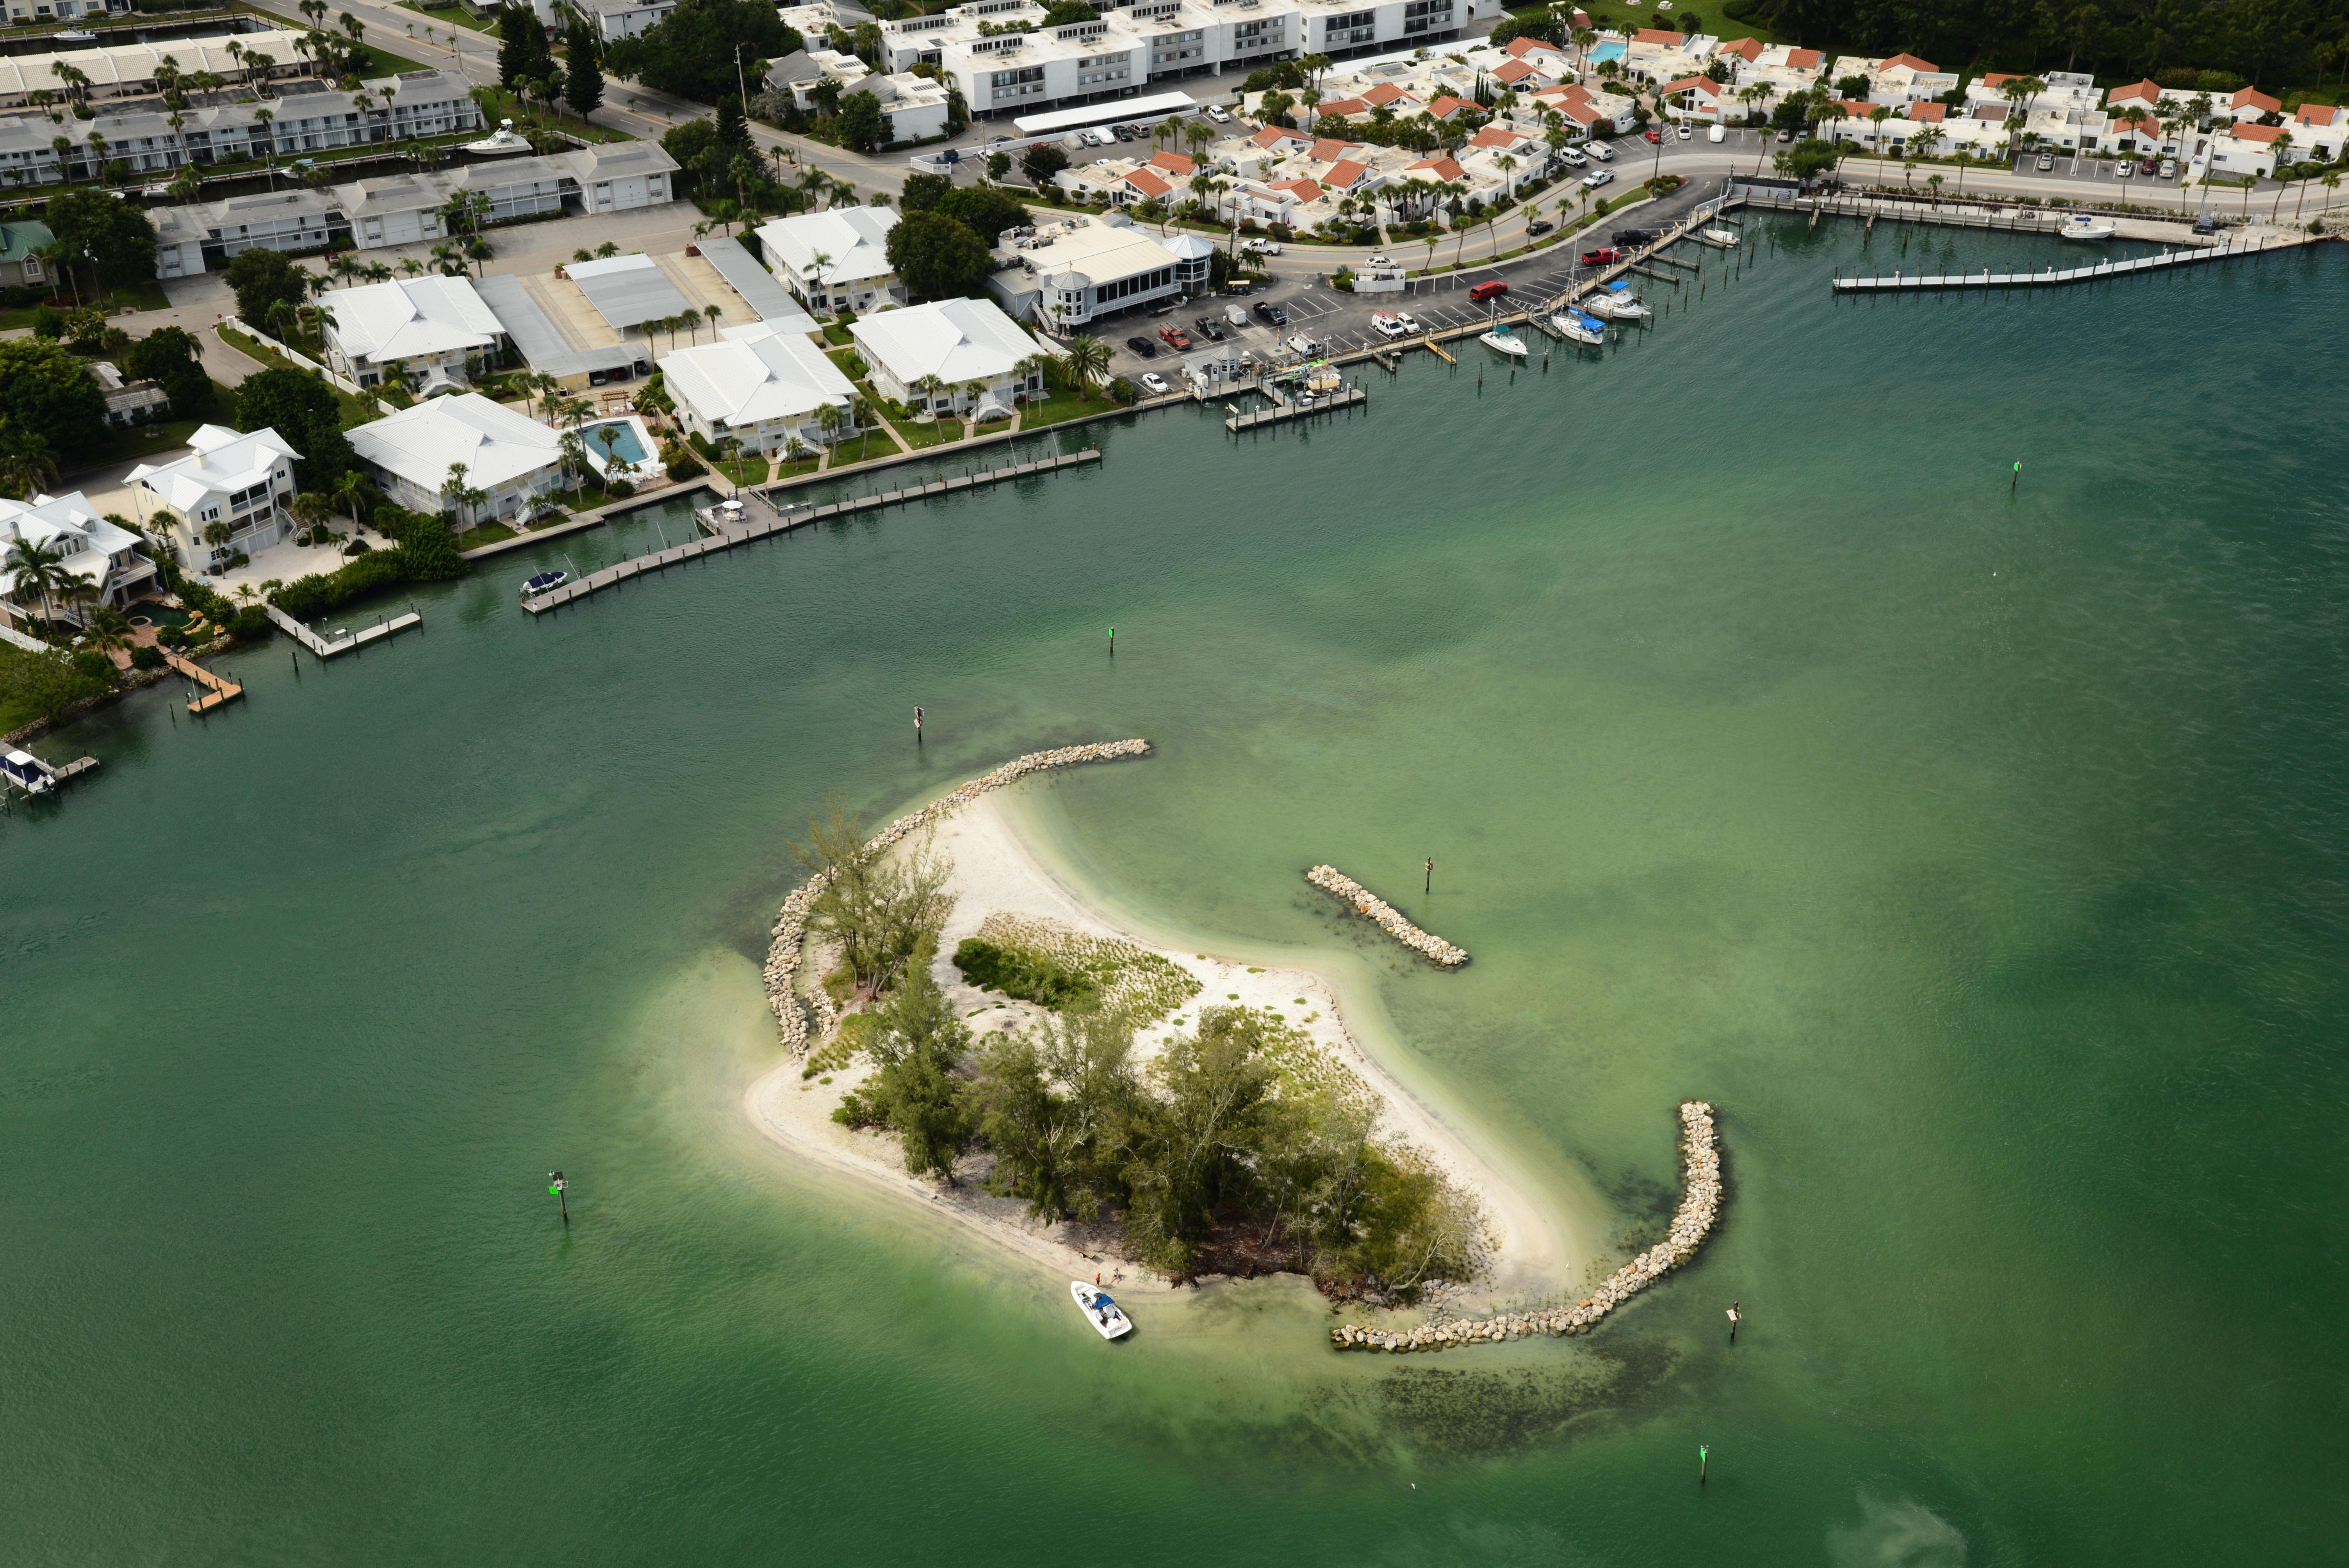 Snake Island 9-9-14 192.jpg